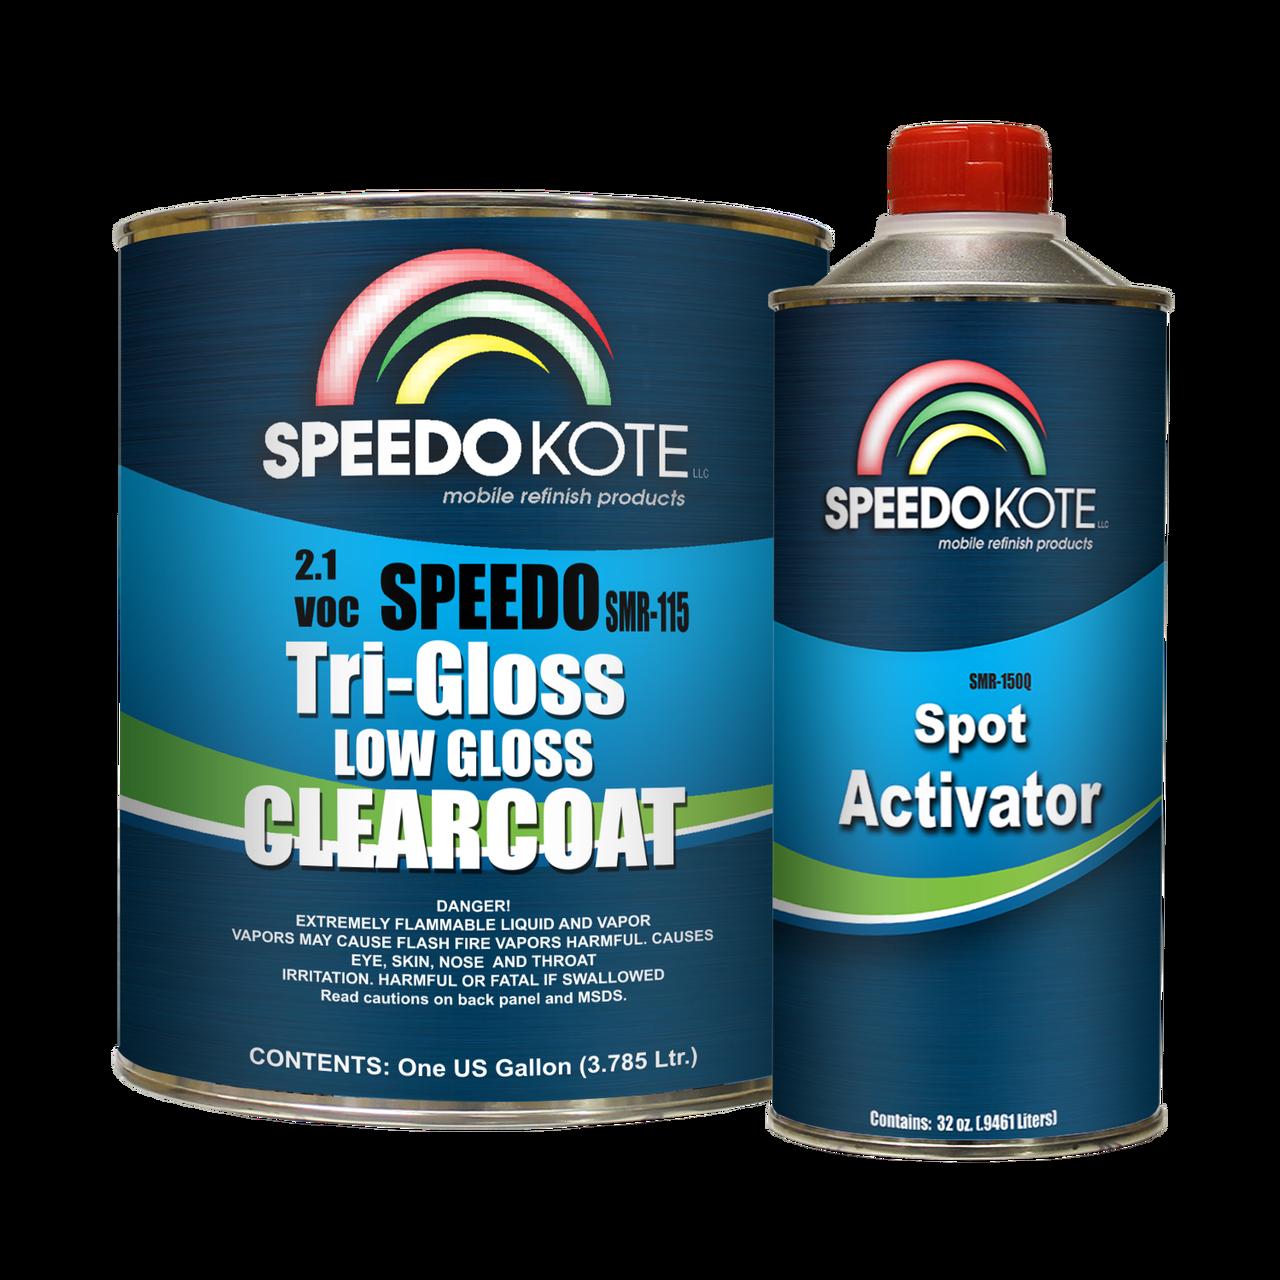 SMR-115/170 Low Gloss 2.1 VOC clear coat Slow Activator